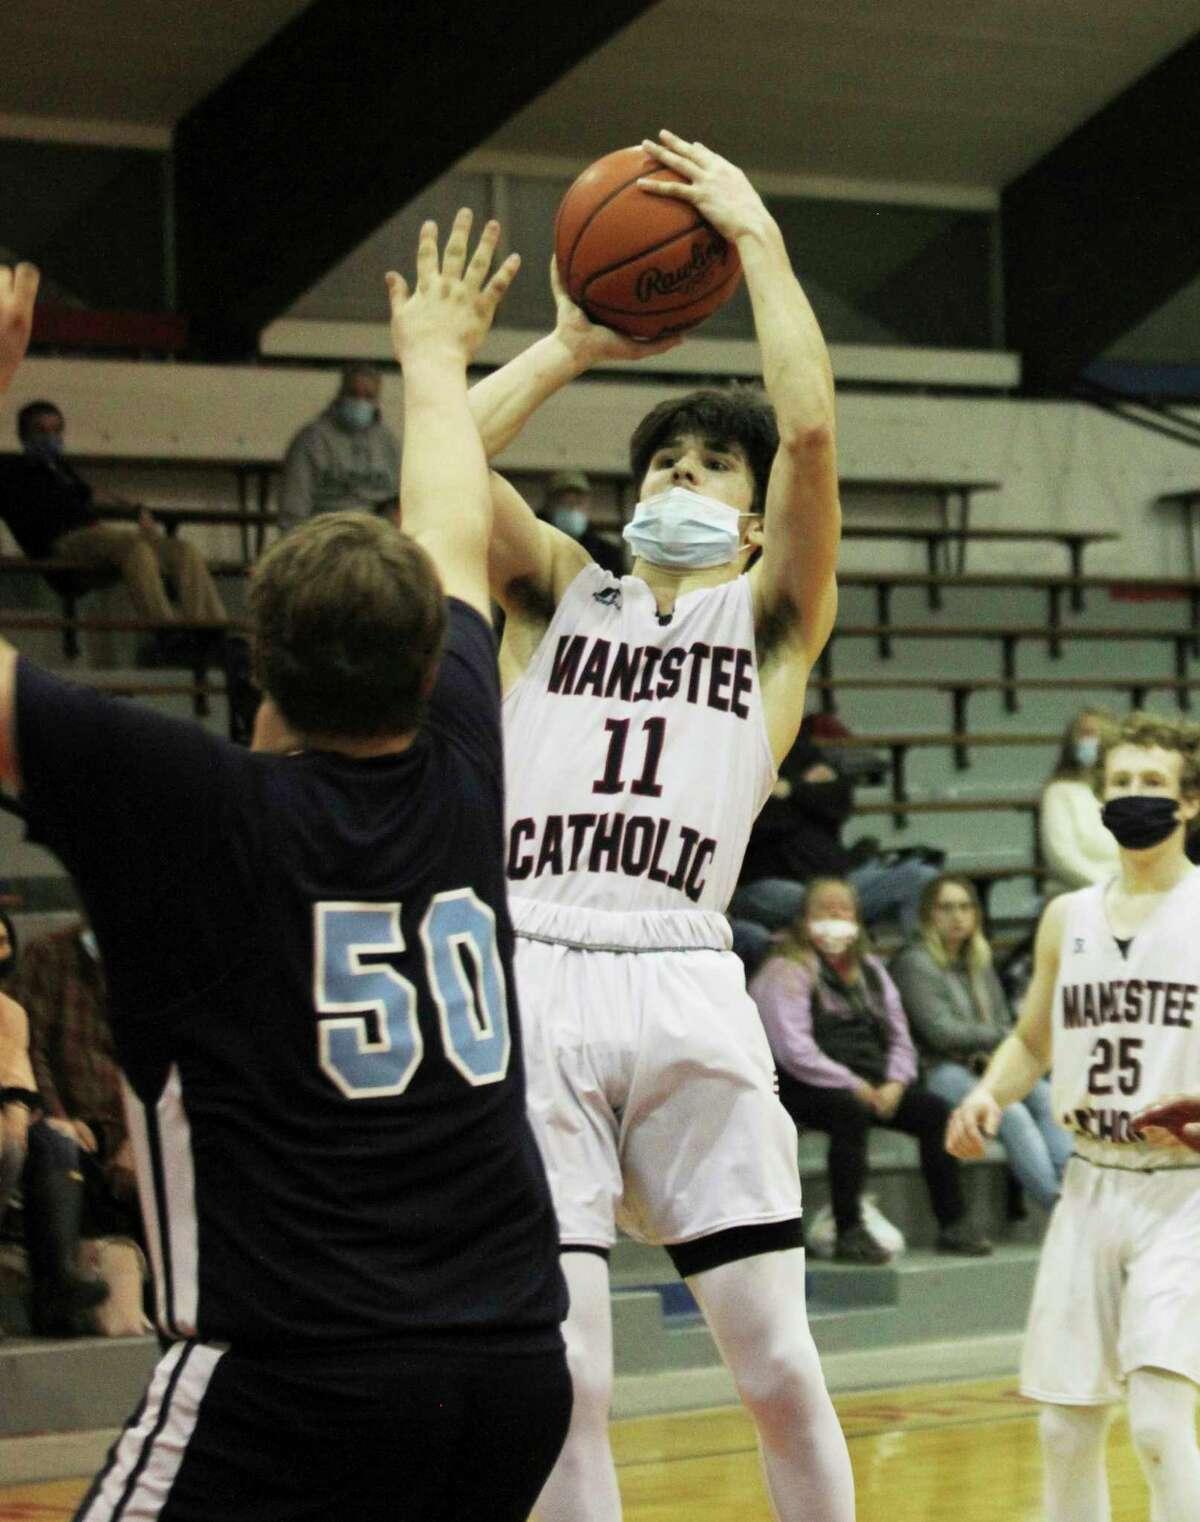 Manistee Catholic Central senior Mateo Barnett elevates for a shot Wednesday against Brethren. (Dylan Savela/News Advocate)